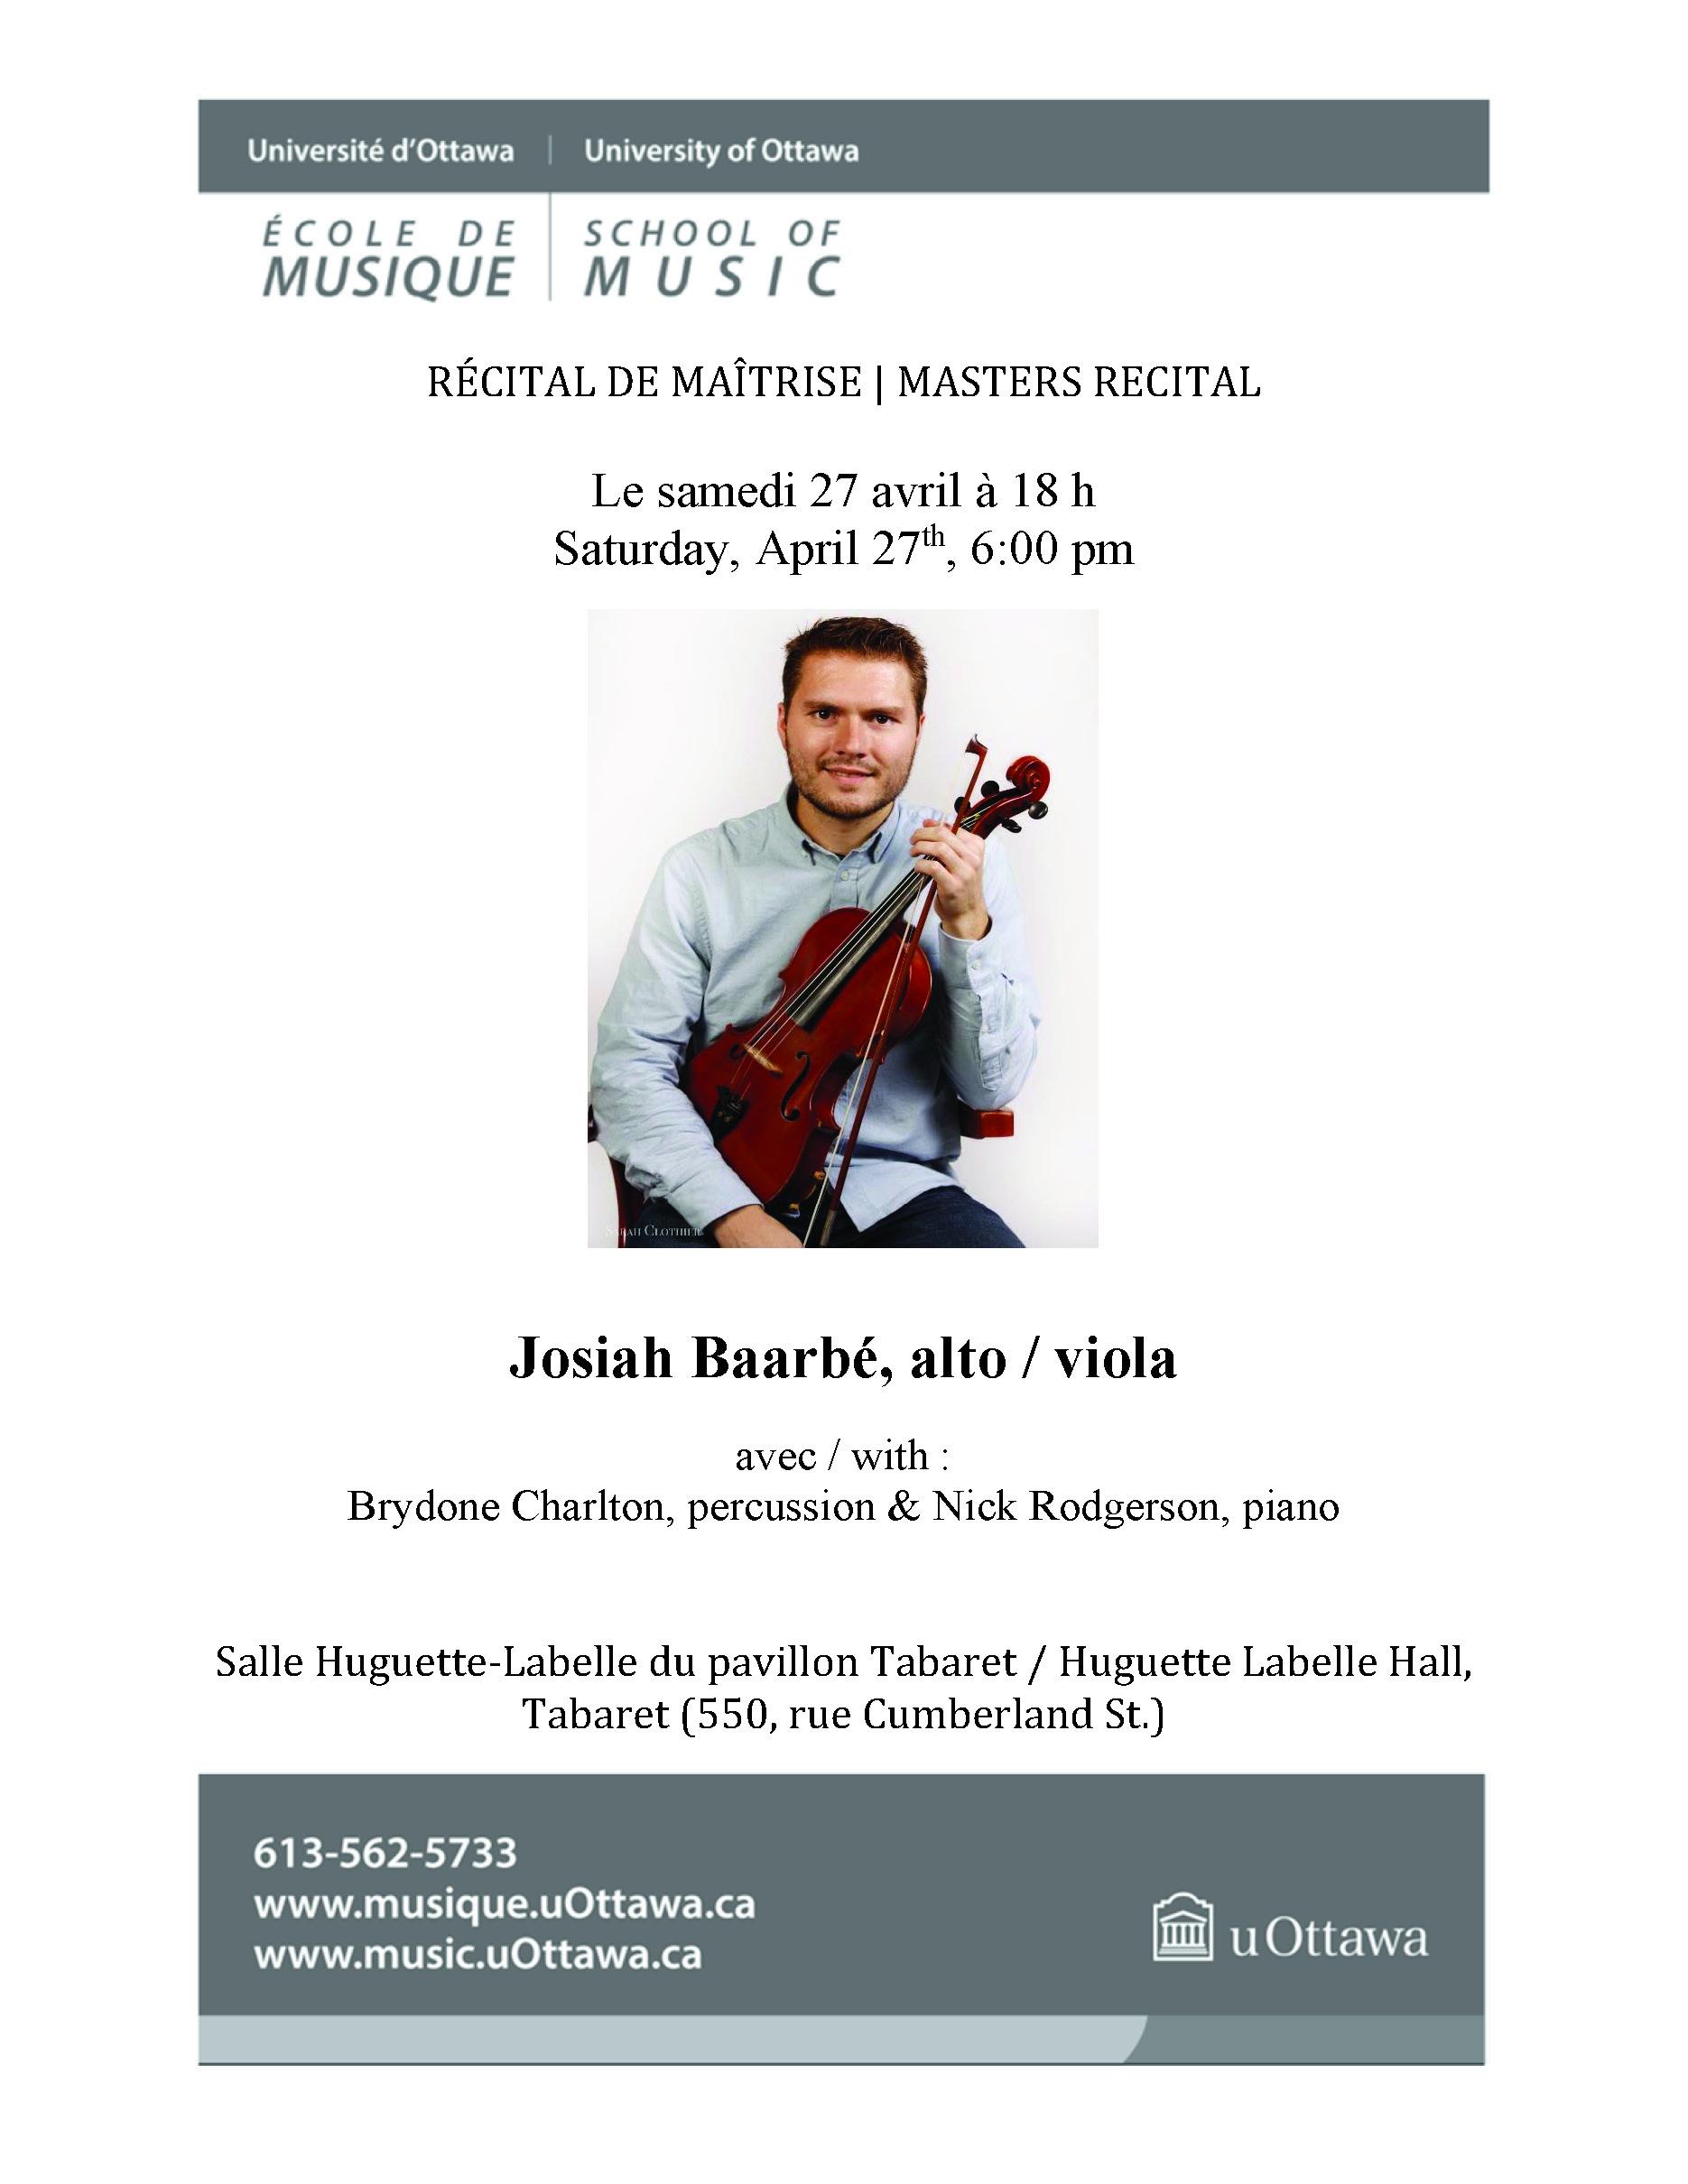 Josiah Baarbe recital program, page 1